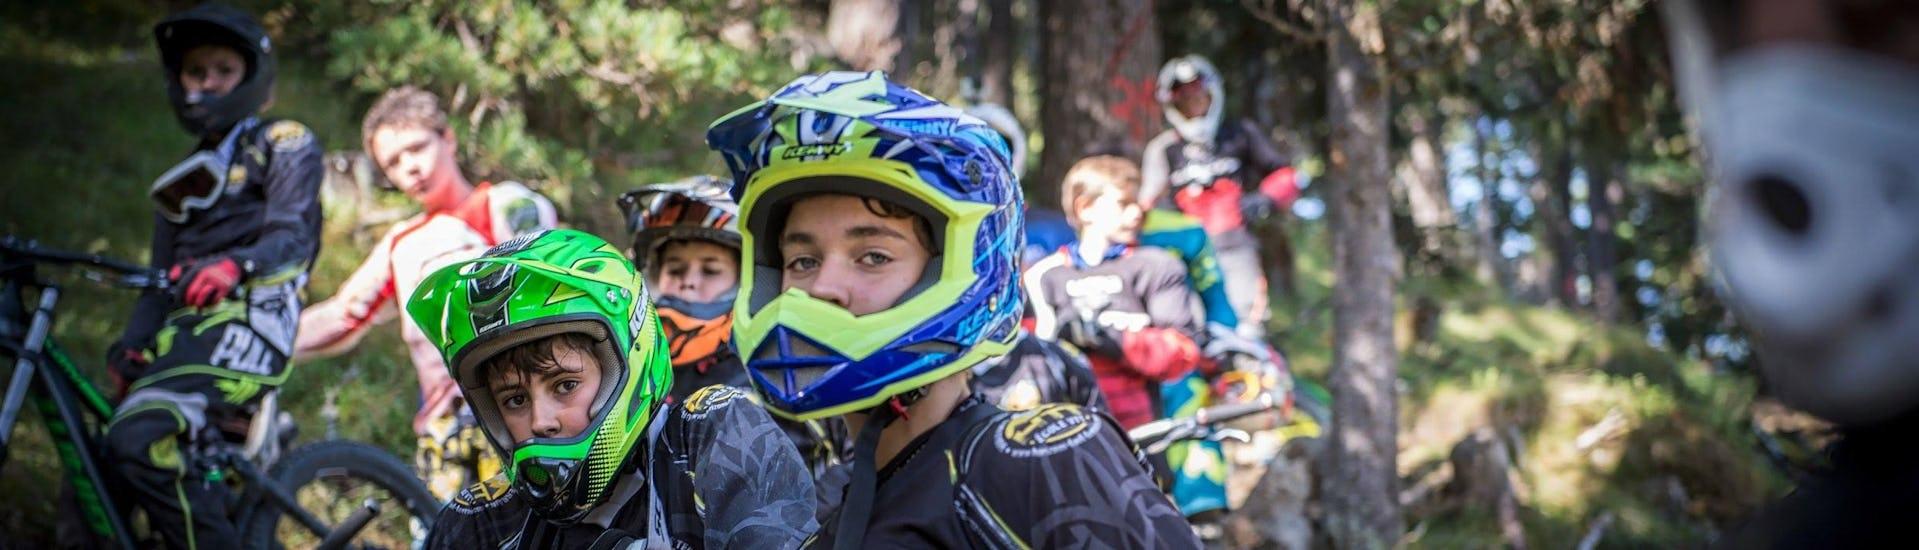 "Mountain Bike ""Mini-Camp"" Training for Kids (8-11 years)"